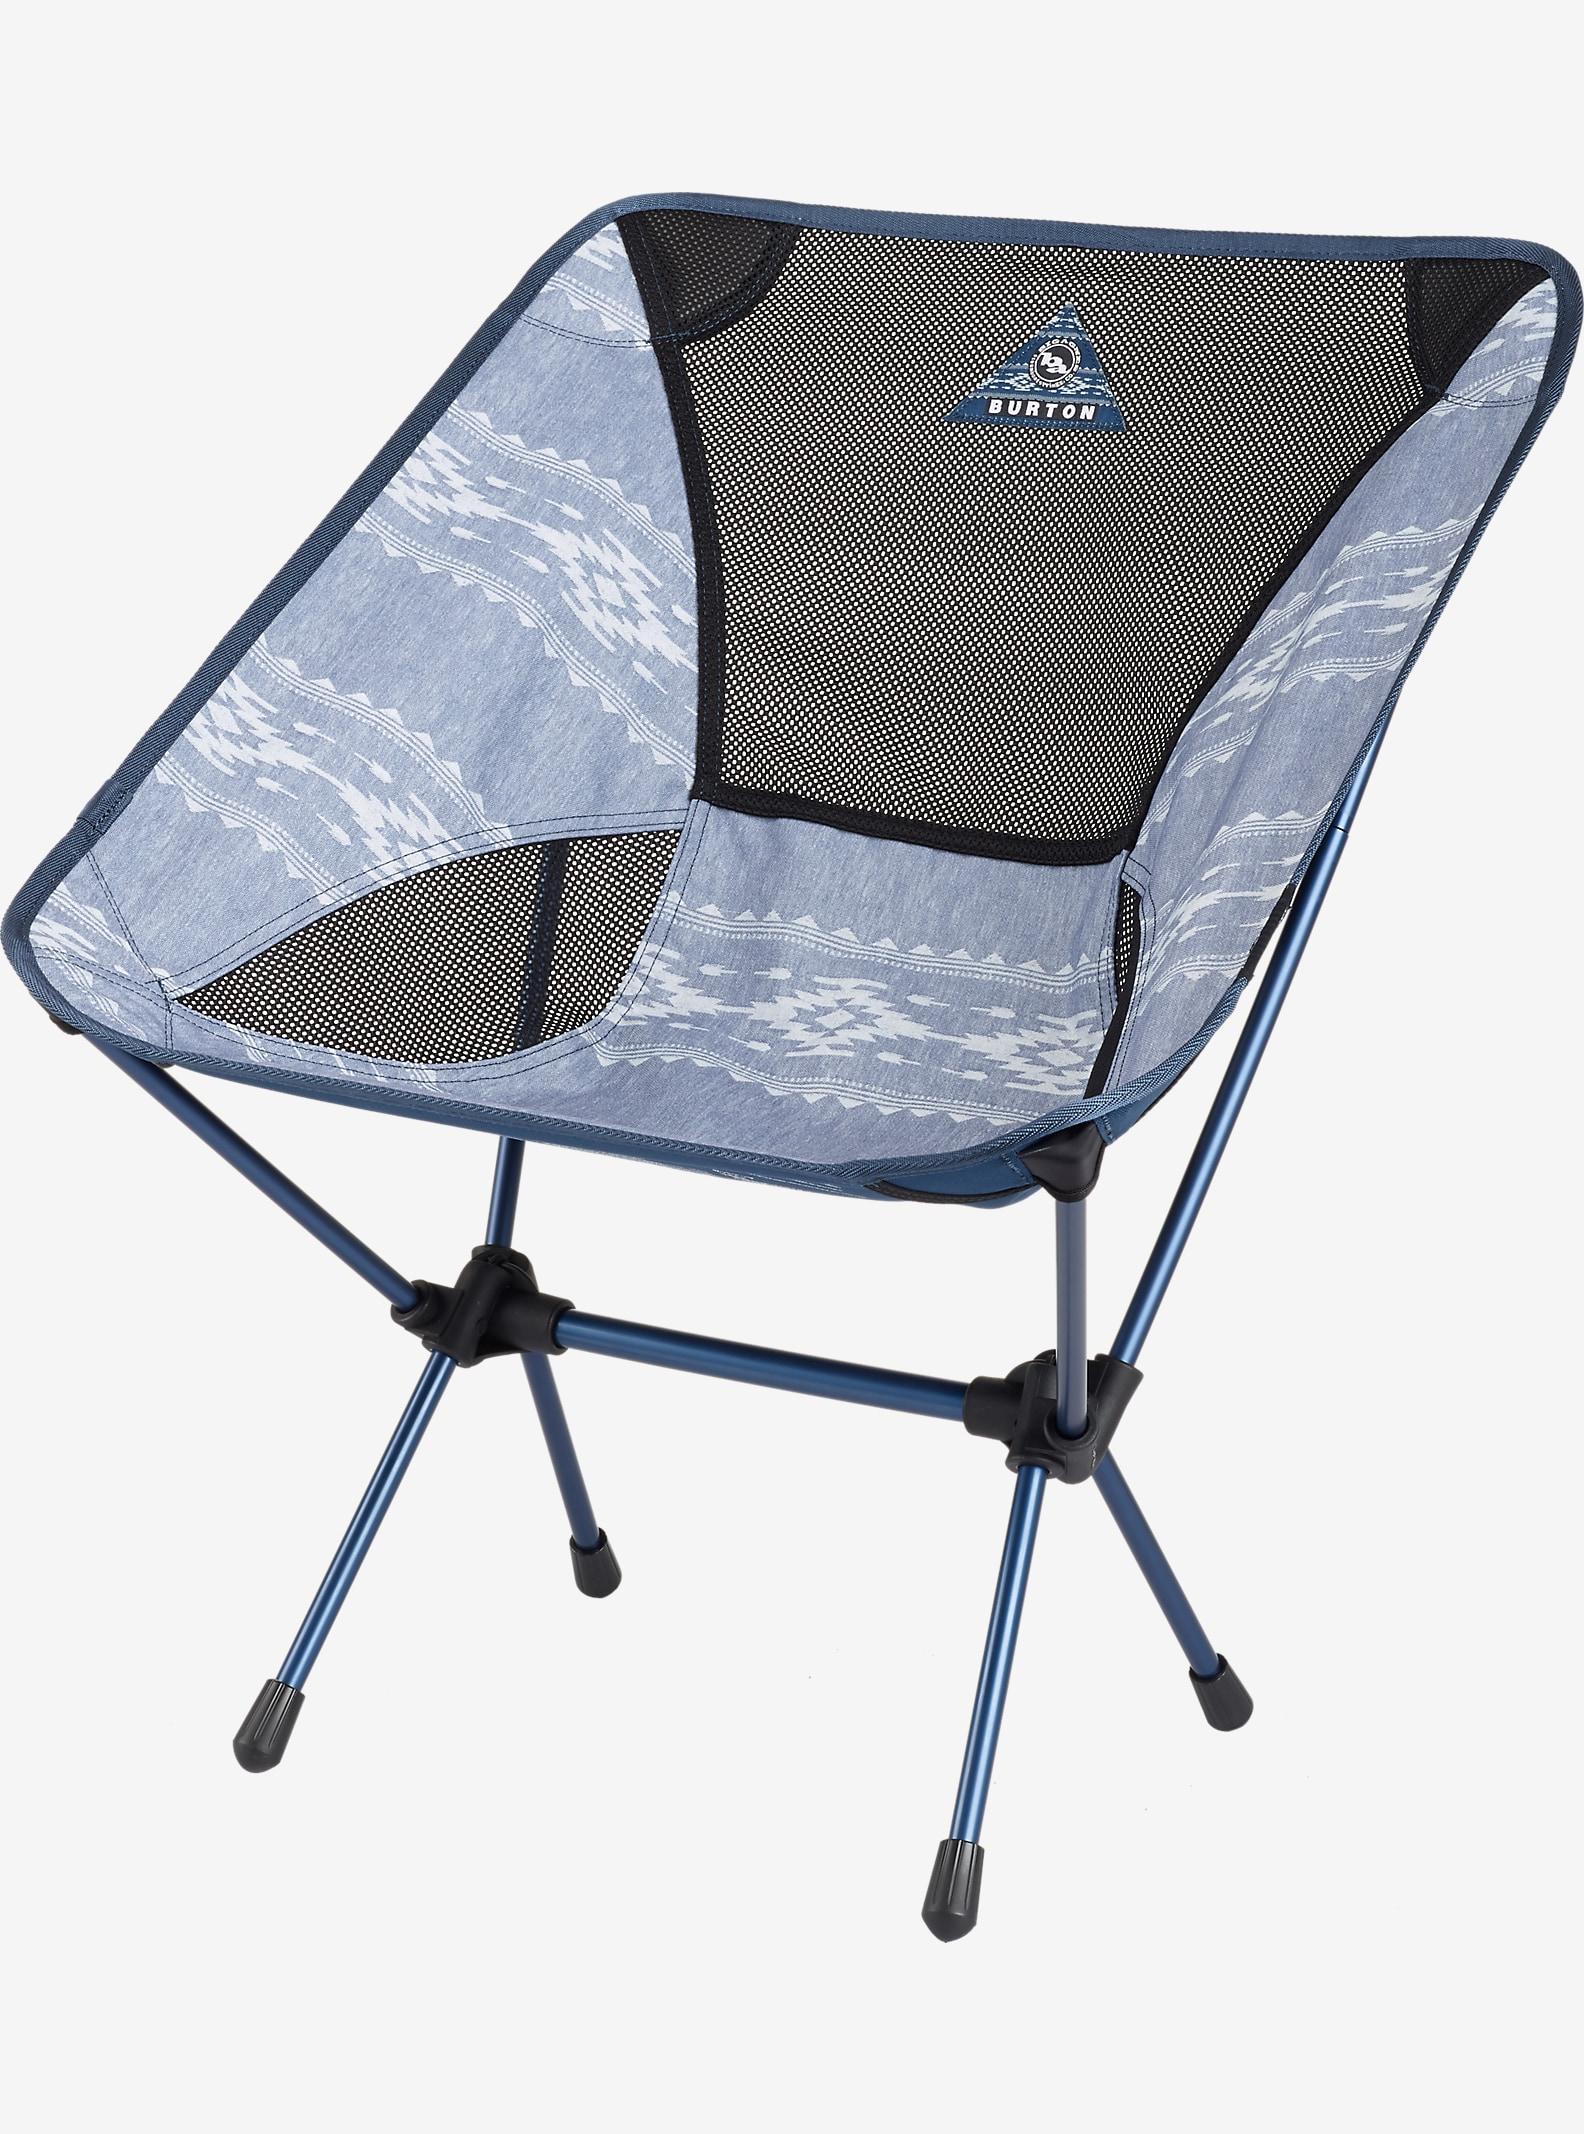 Big Agnes x Helinox x Burton Camp Chair shown in Famish Stripe